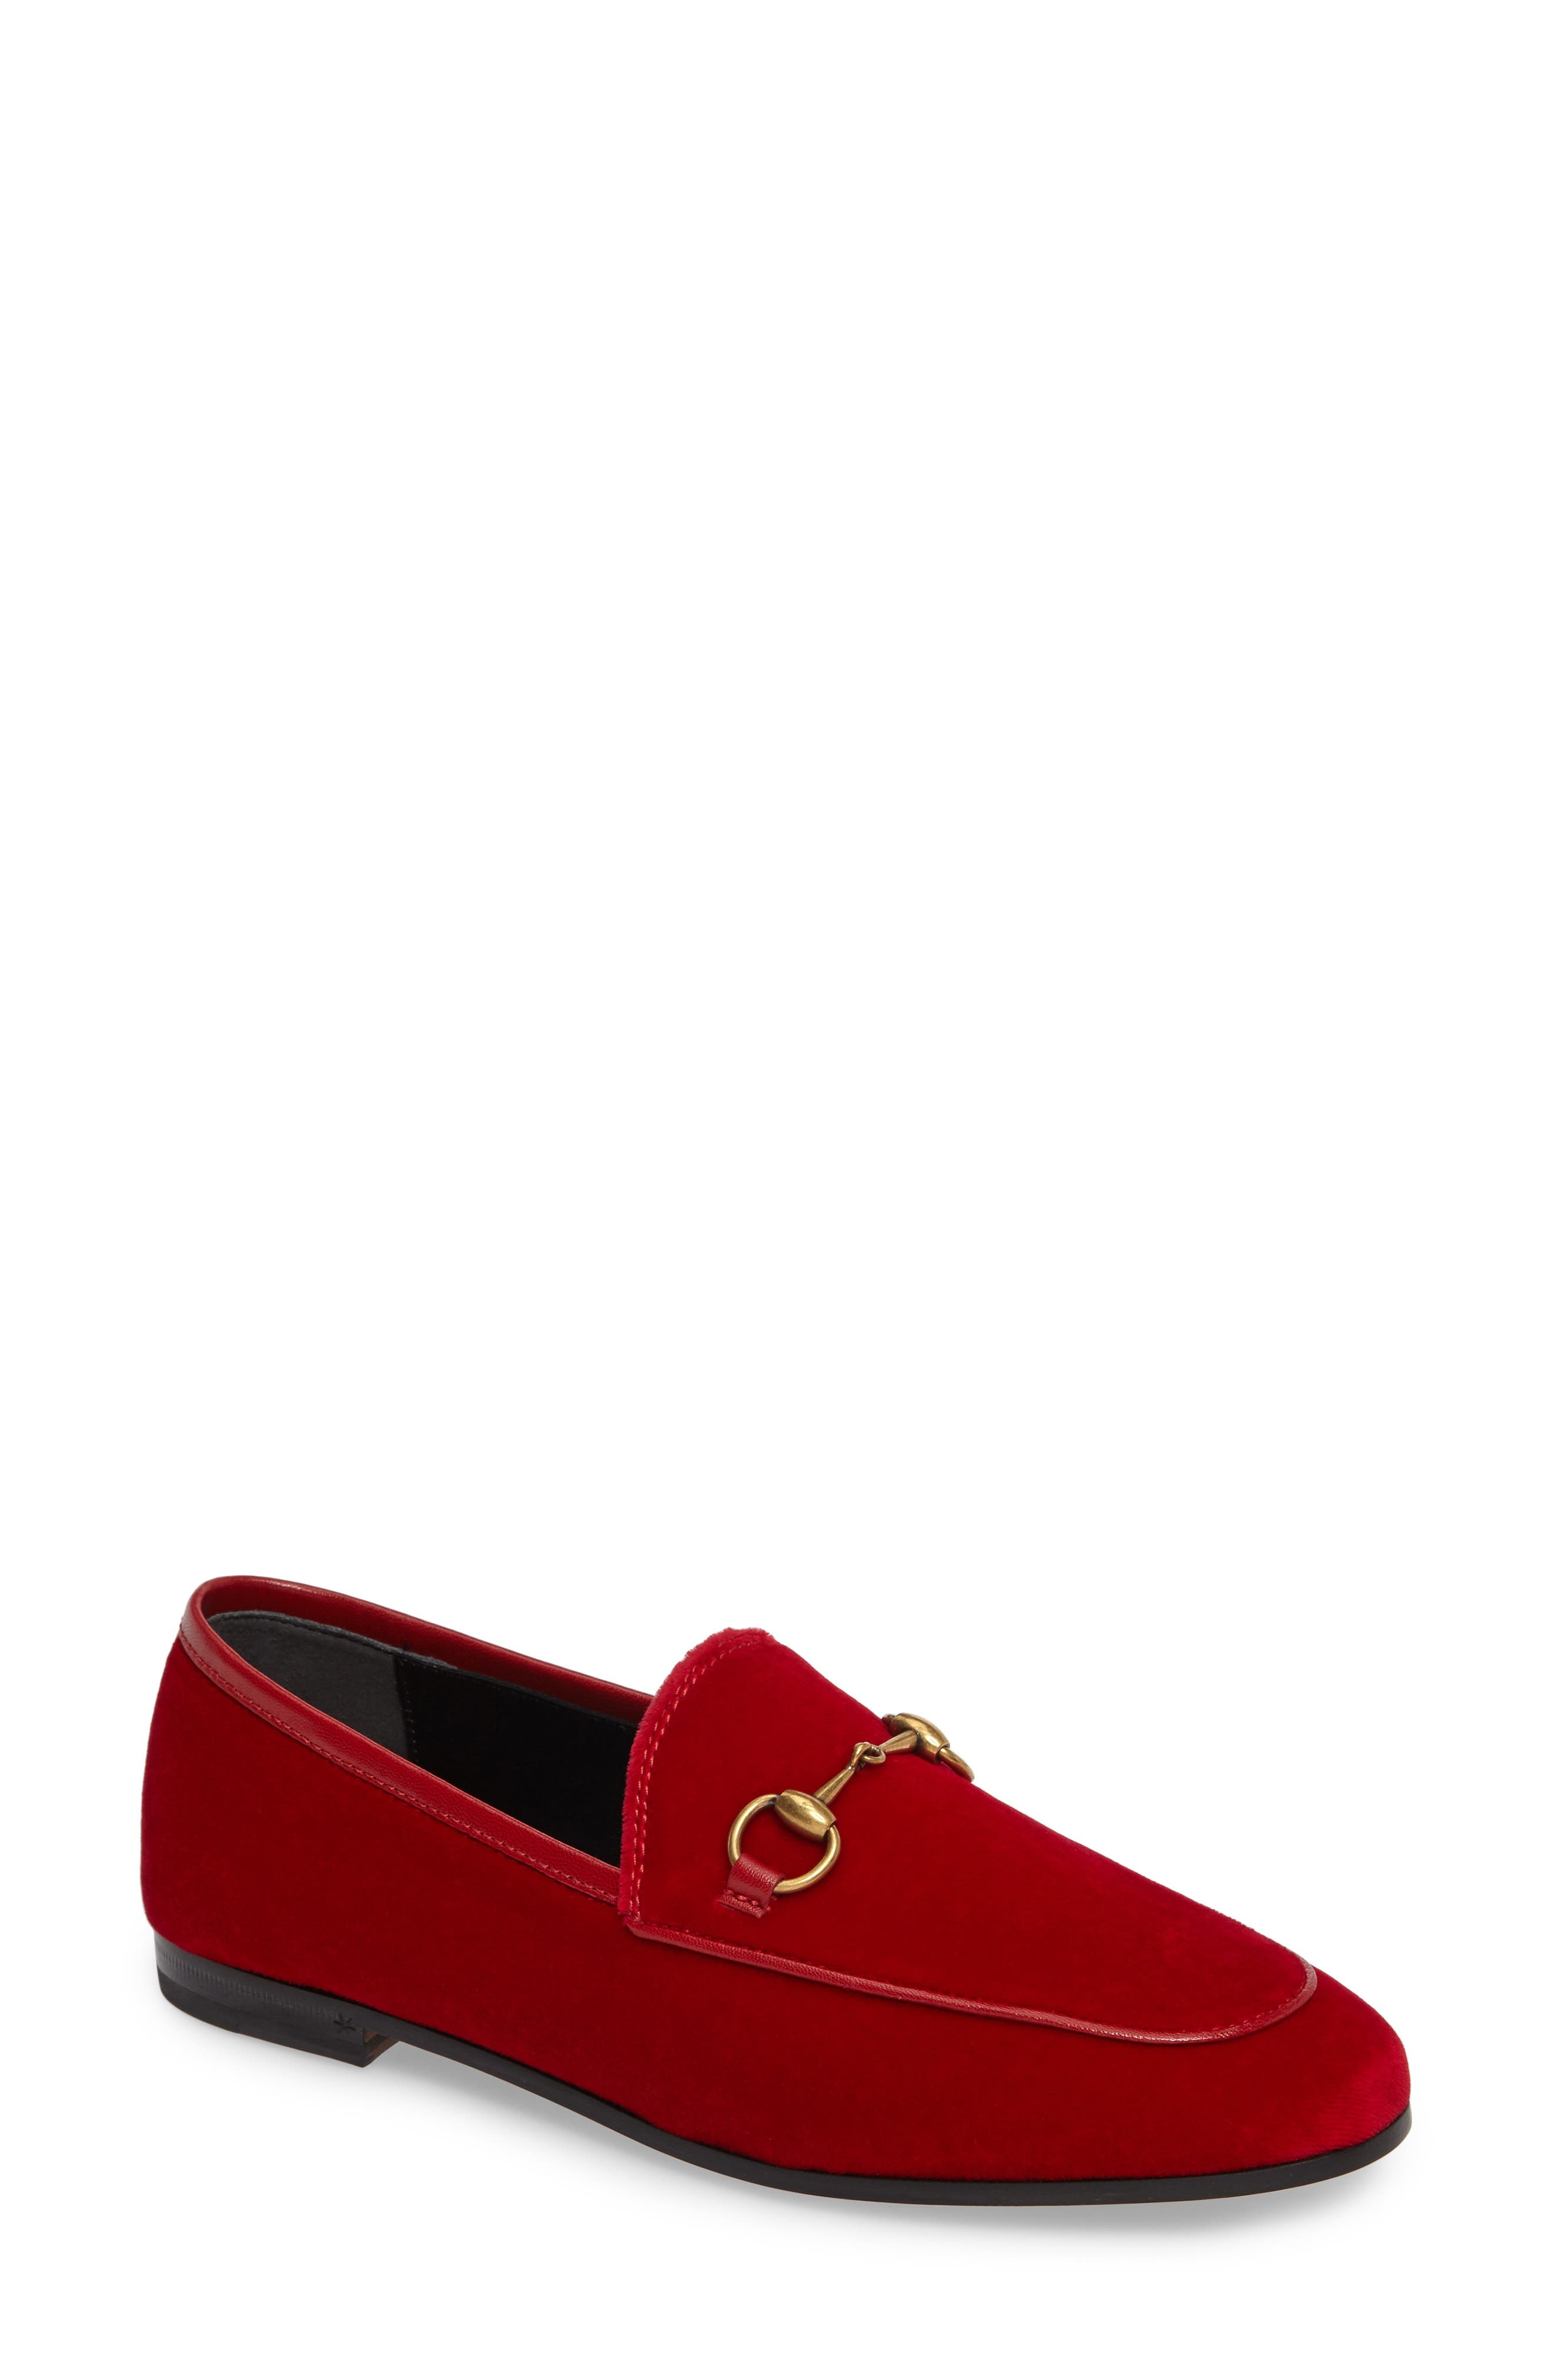 Alternate Image 1 Selected - Gucci Brixton Velvet Loafer (Women)